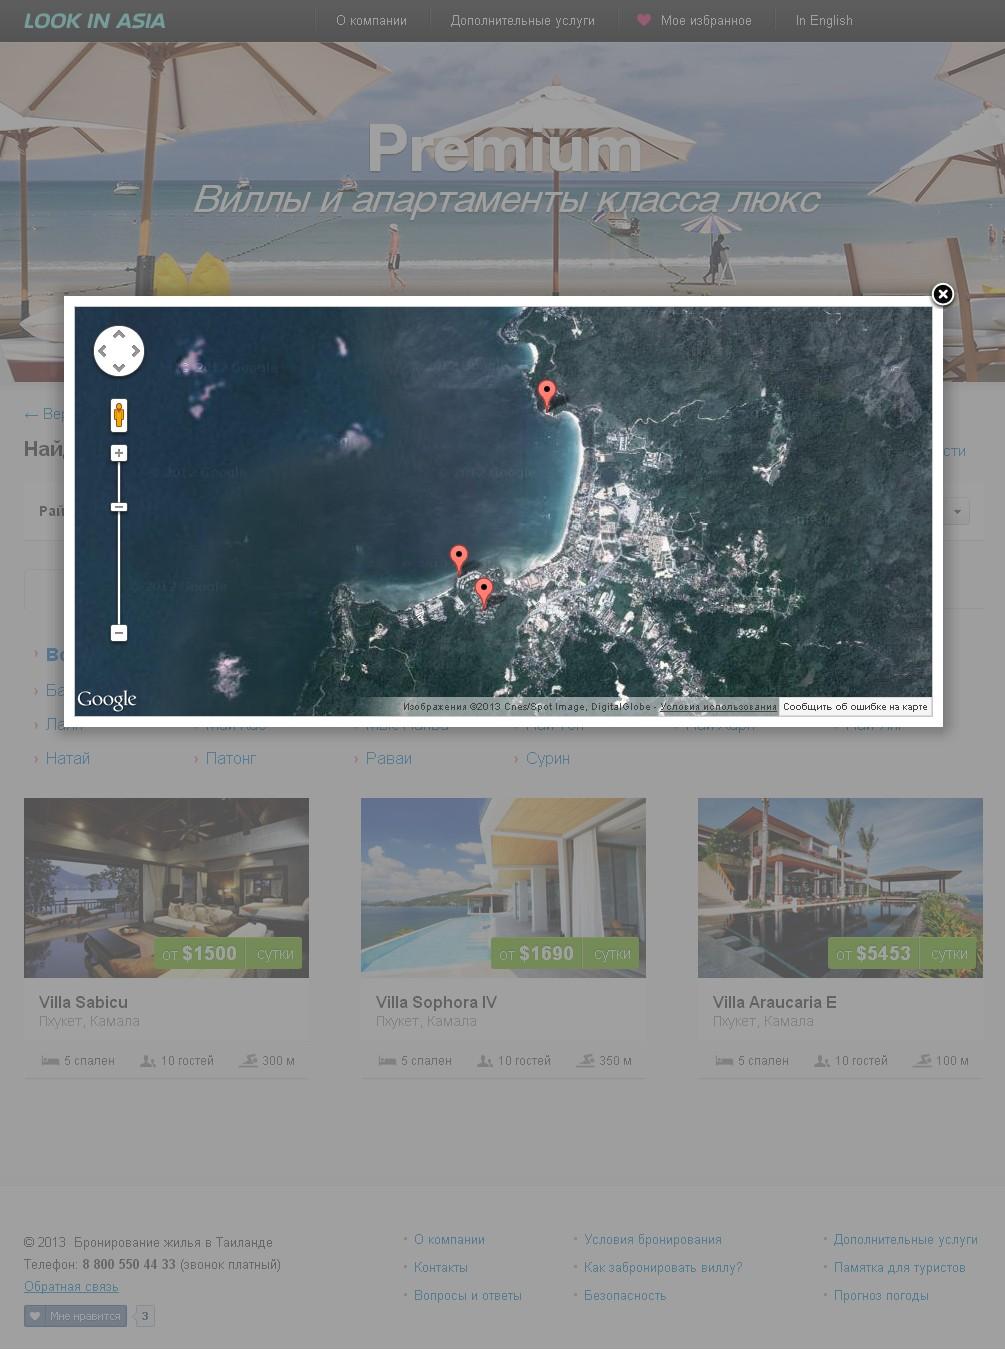 Look In Asia - Система бронирования апартаментов и вилл + CRM [Perfica.CMS]